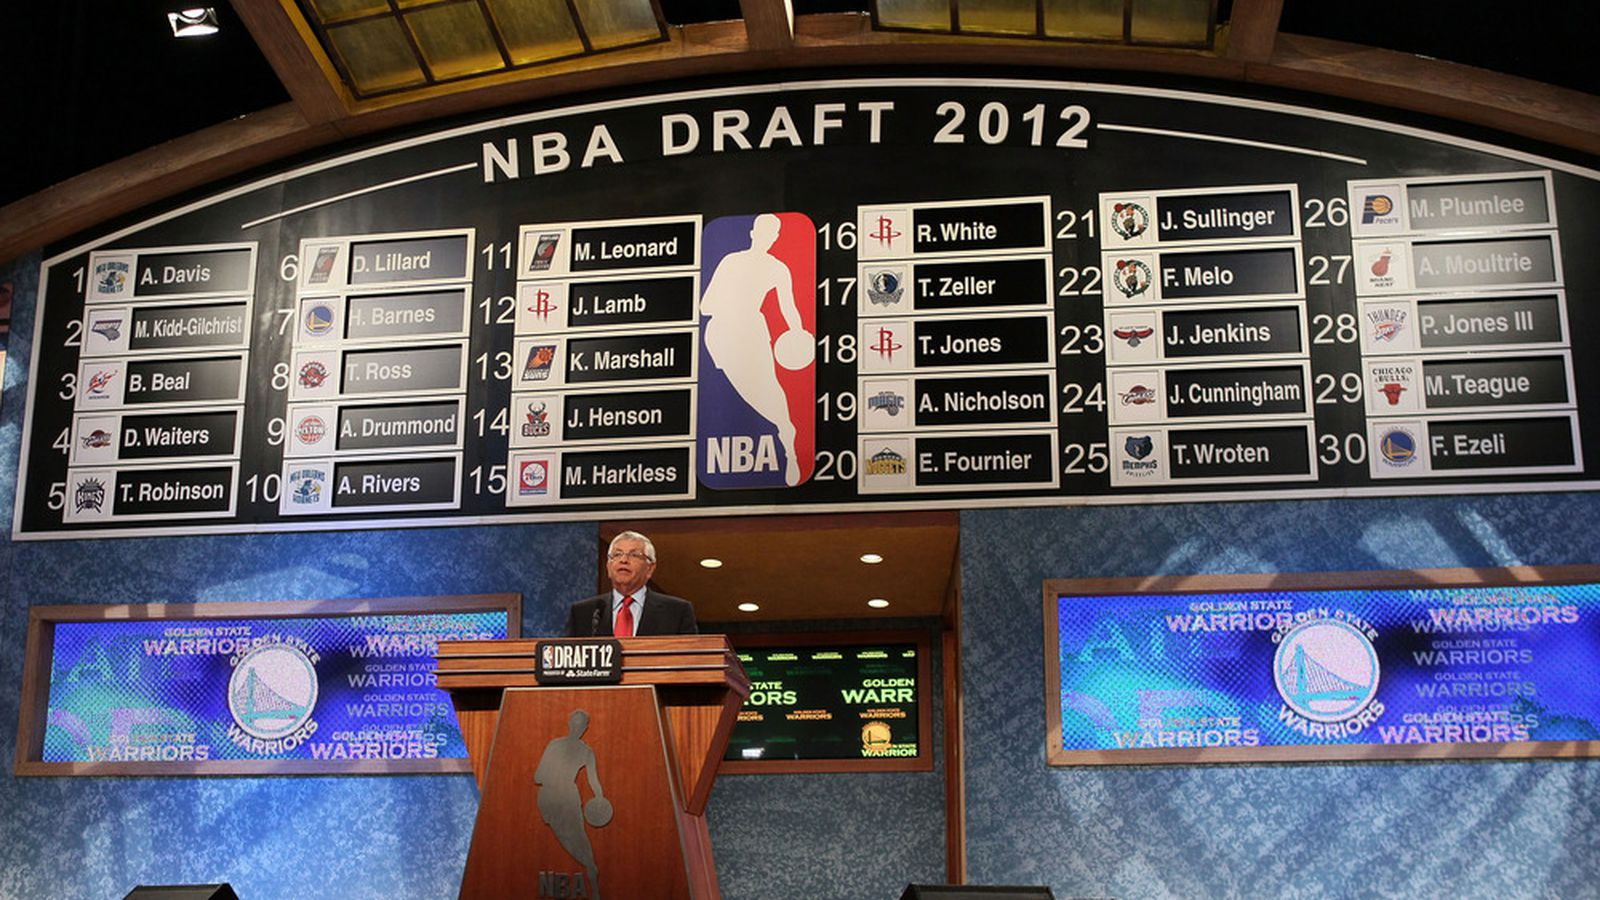 Nba Draft: NBA Draft 2012: Magic Select Andrew Nicholson, Heat Trade